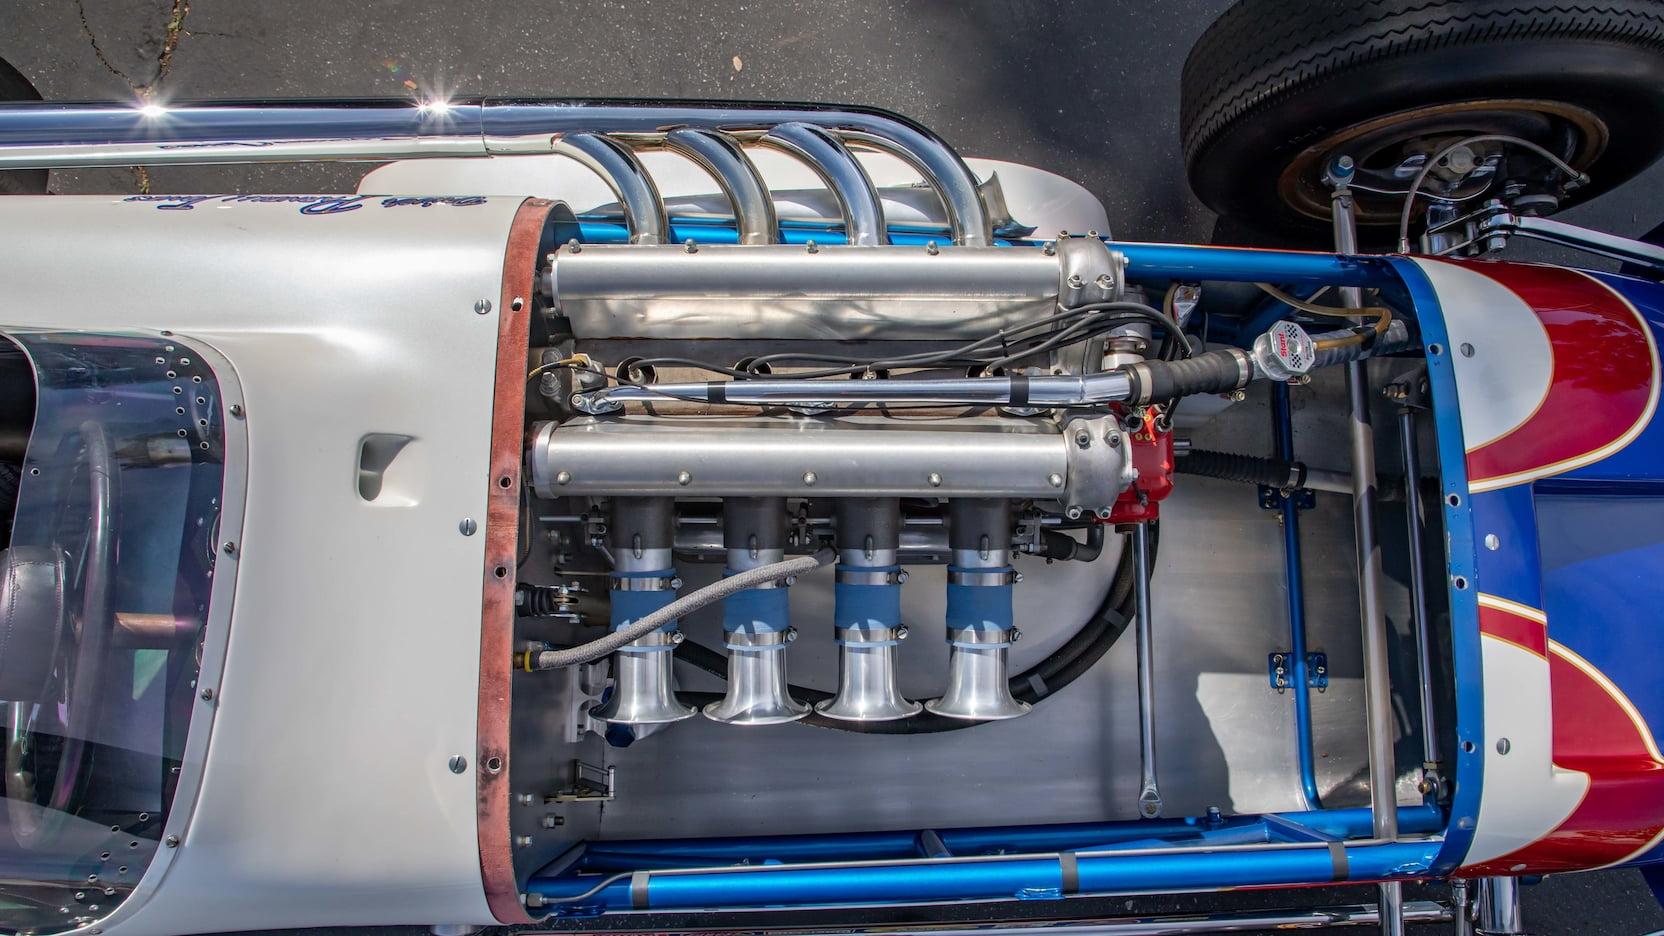 1960 Watson Offenhauser Ol Calhoun Replica Parnelli Jones Mecum engine